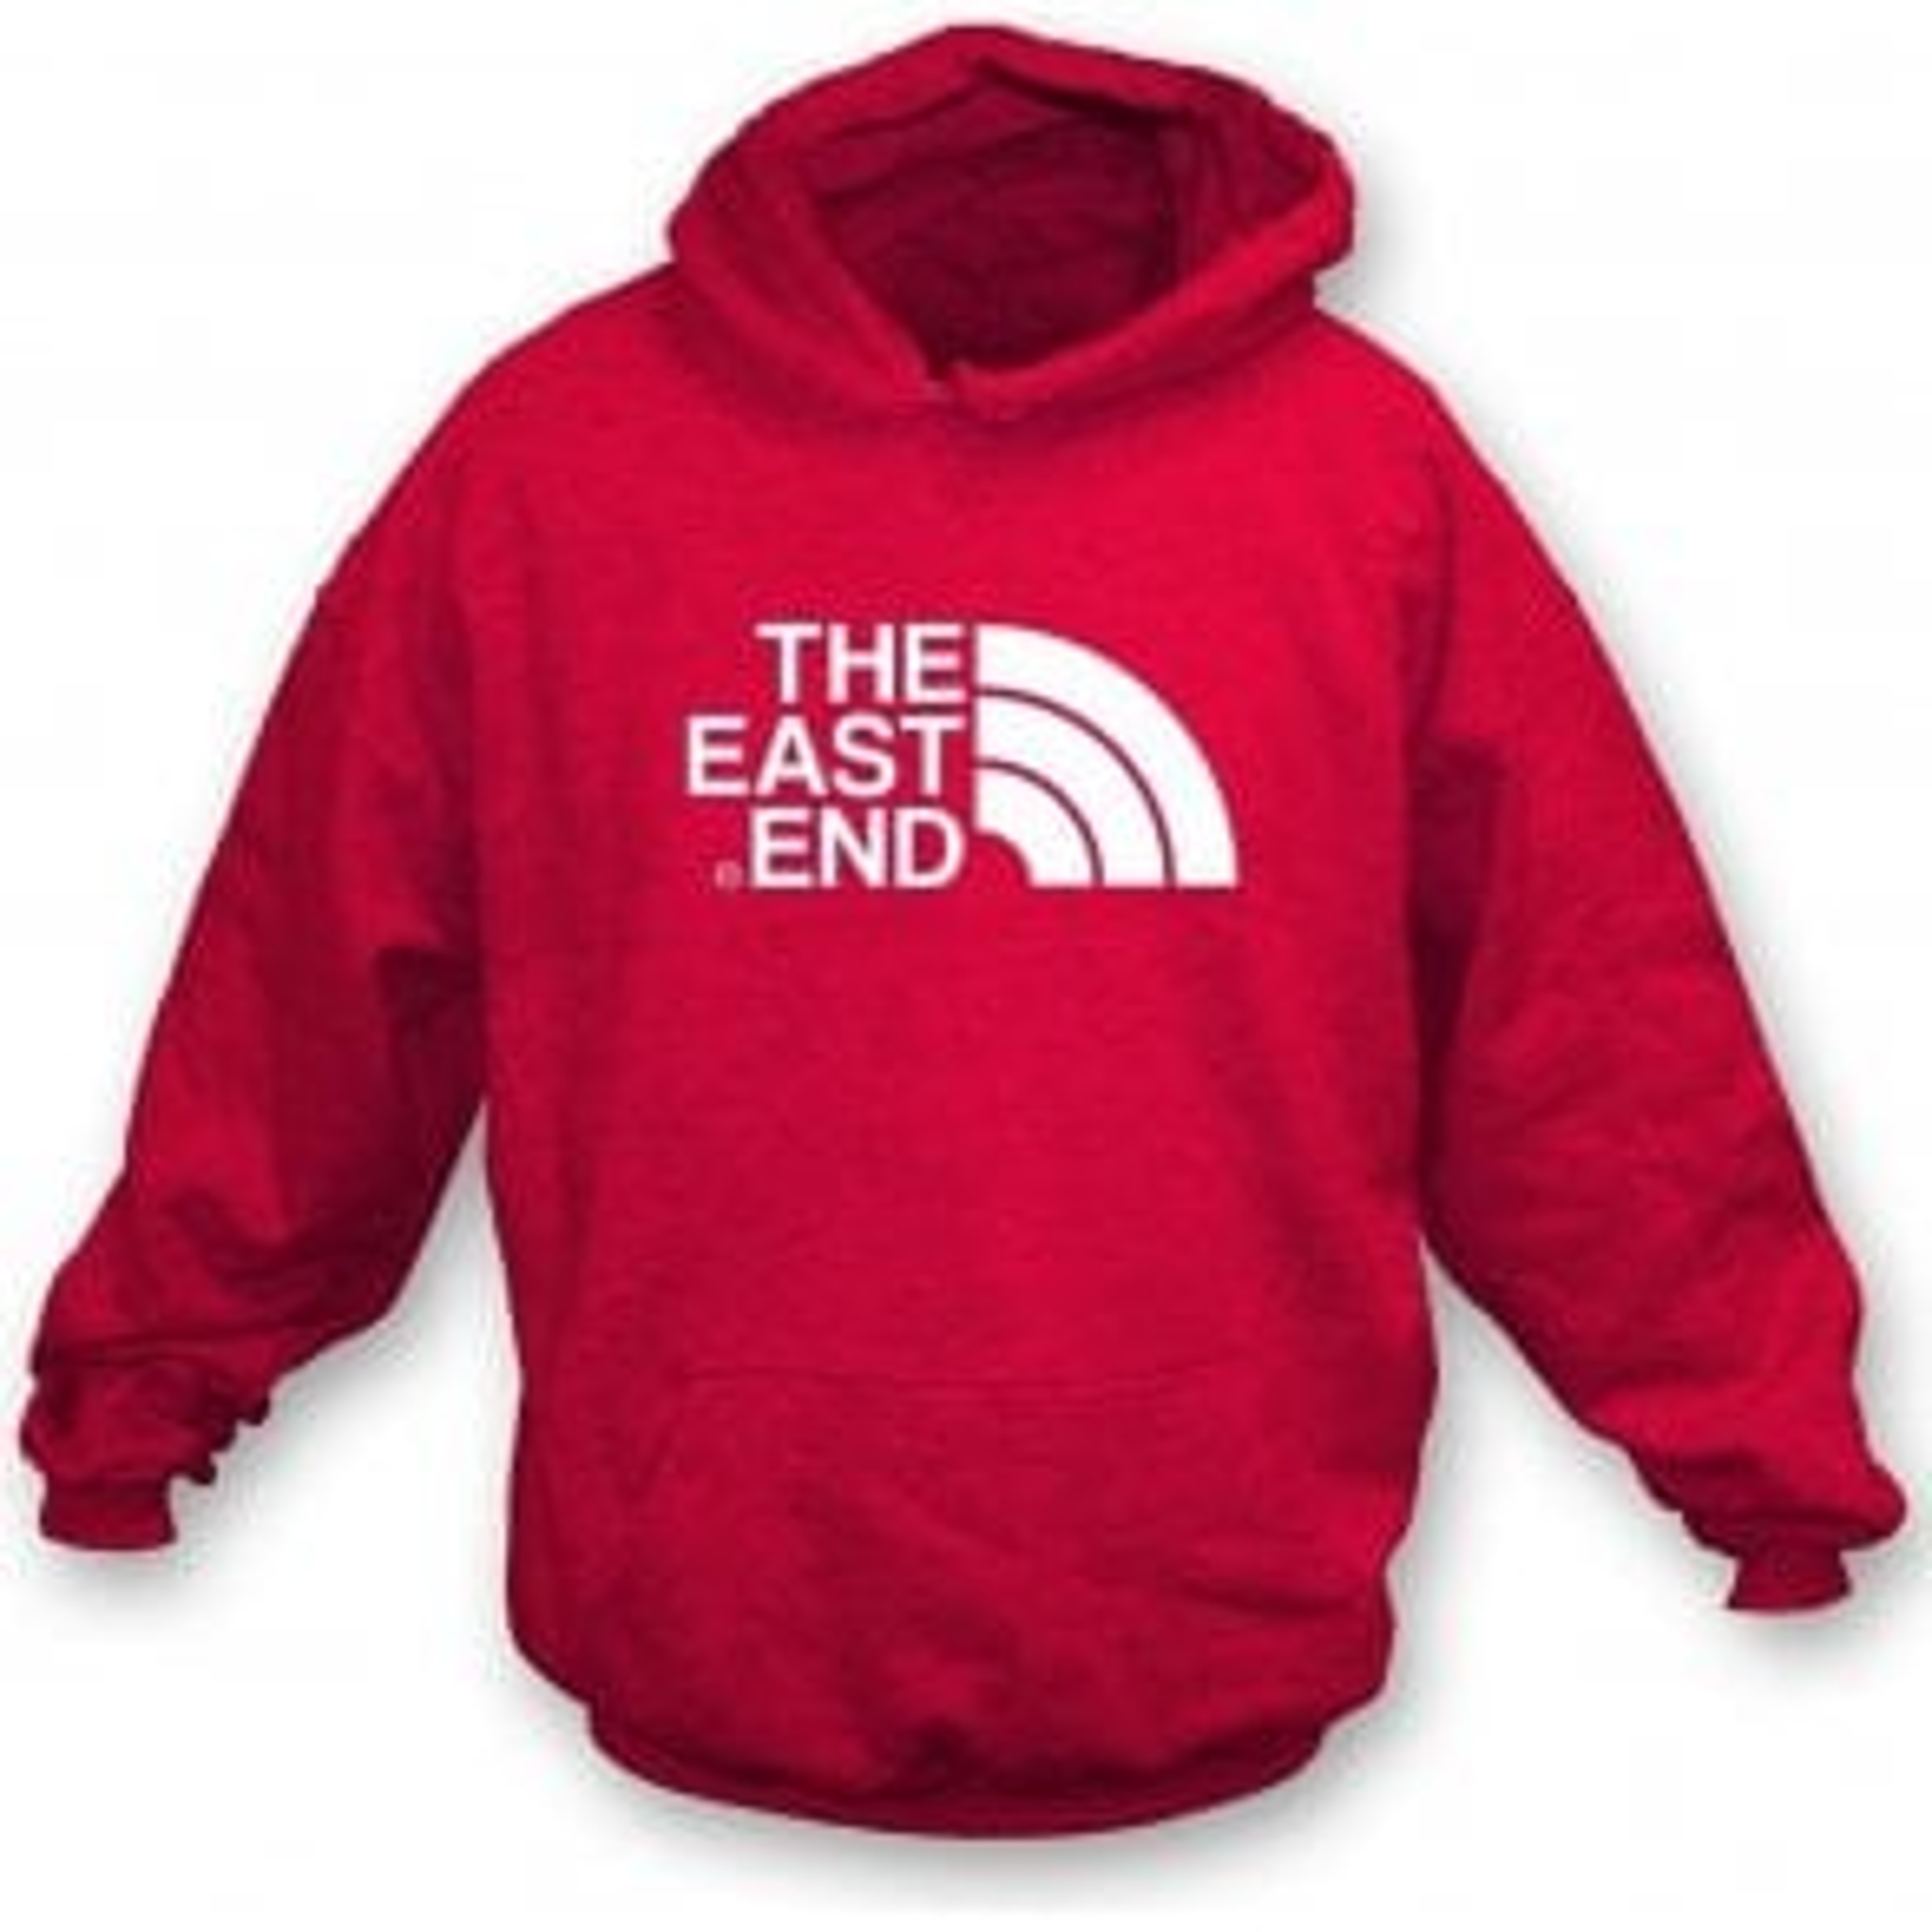 The East End (Leyton Orient) Hooded Sweatshirt